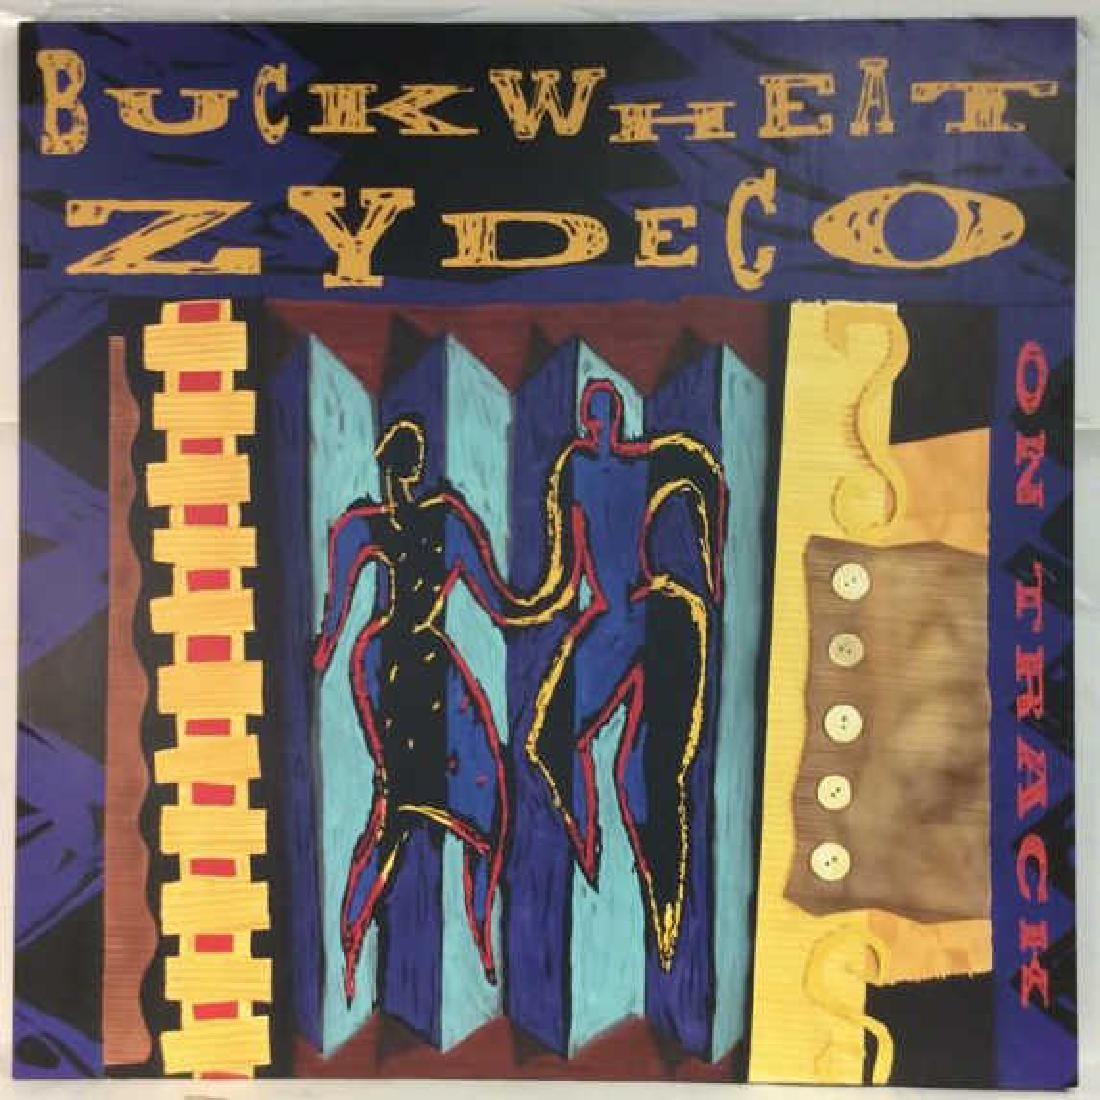 JOE TAYLOR, Buckwheat Zydeco, Hey Joe, Canvas